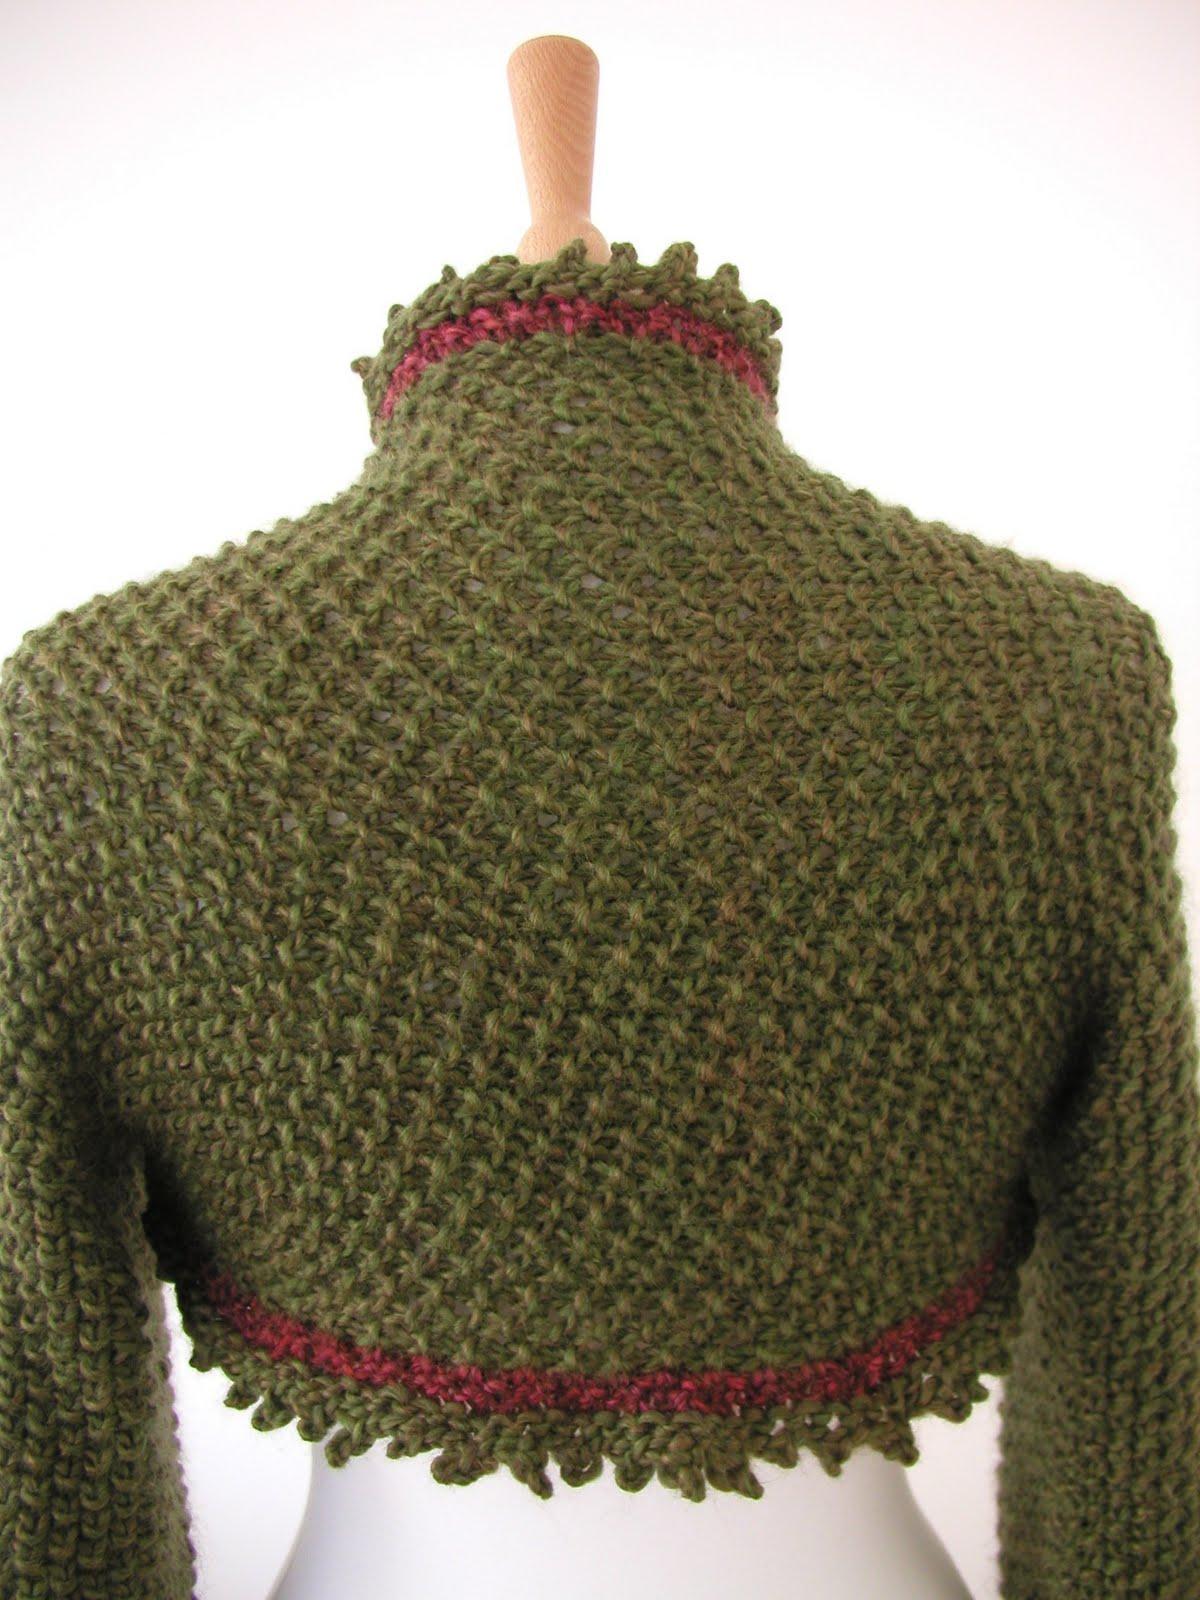 Holly Berry Shrug Knitting Pattern